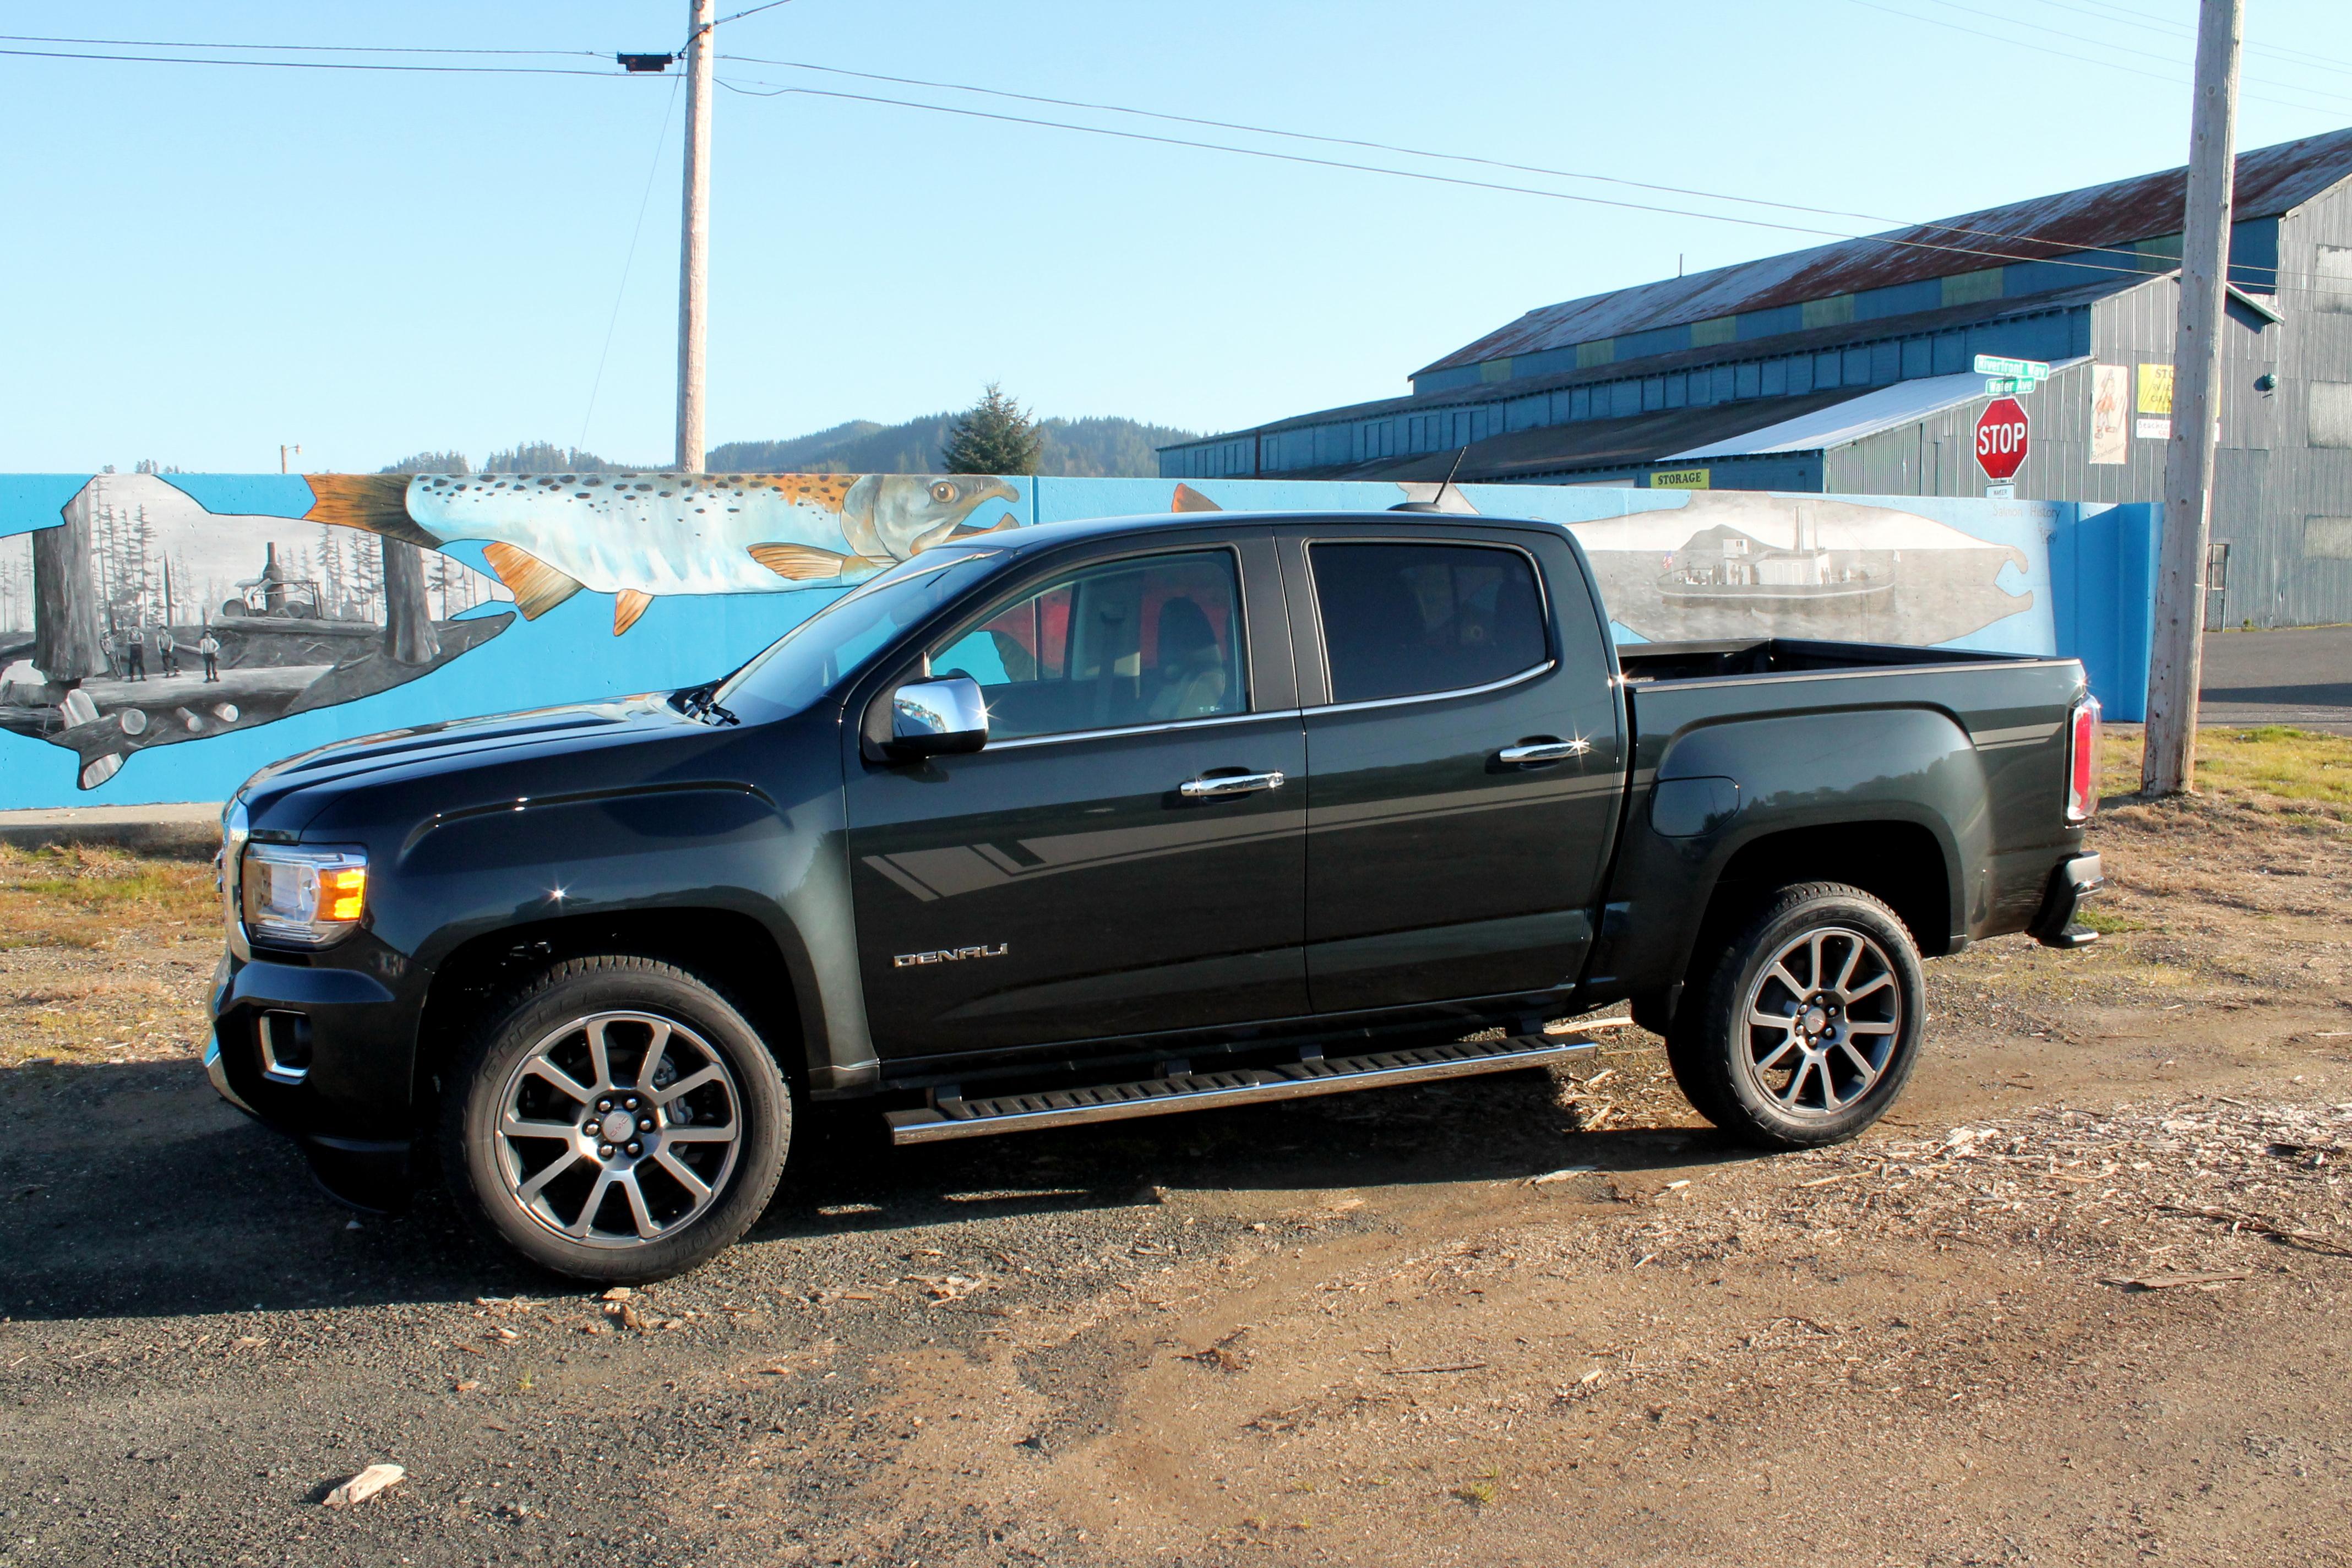 breaker gmc canyon  chevy colorado truck mid body  door rally accent vinyl stripes decal